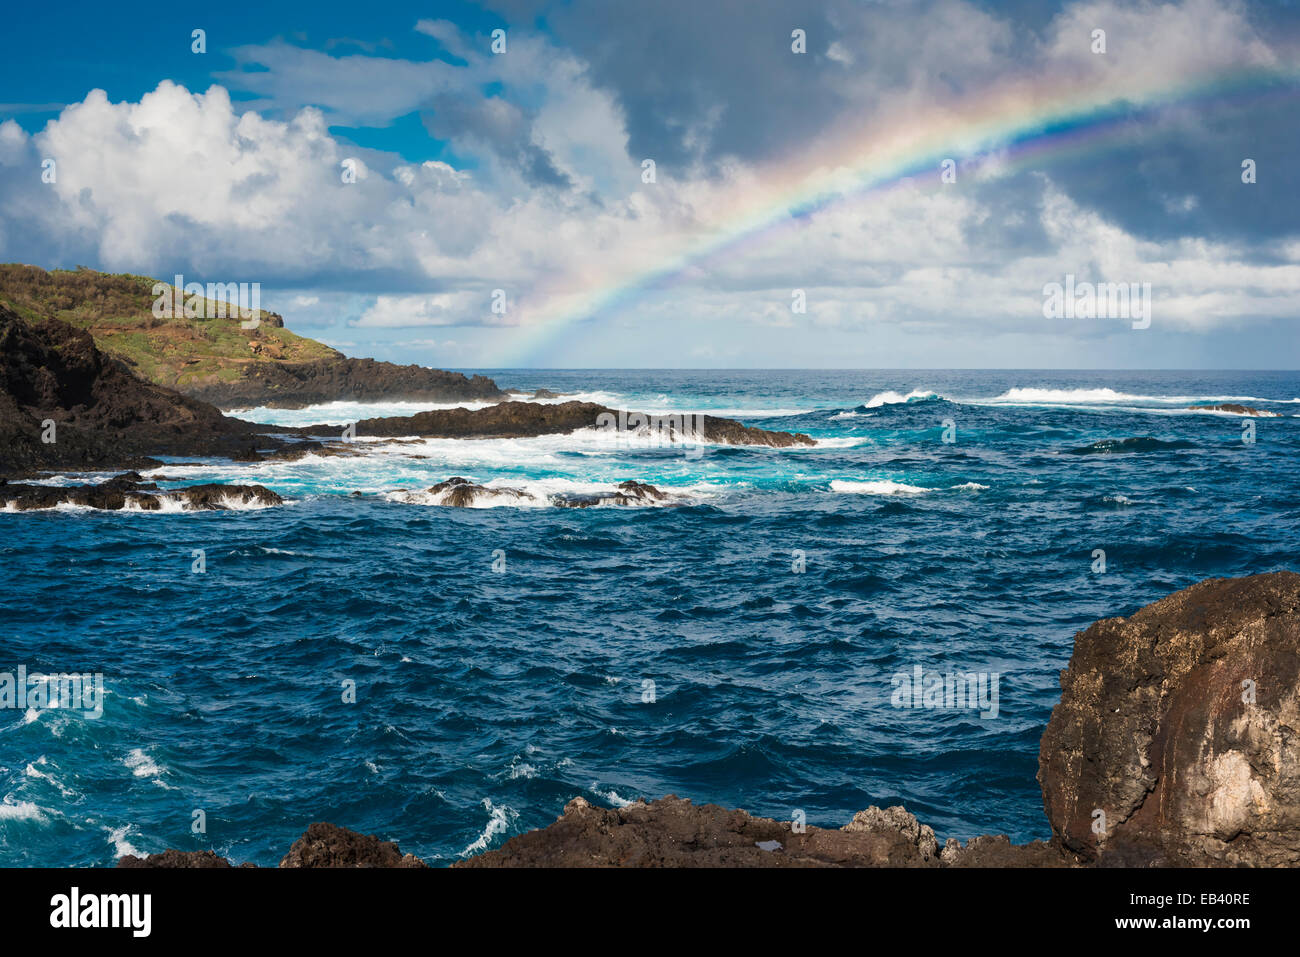 choppy-seas-and-rainbow-in-the-port-of-garachico-renowned-for-having-EB40RE.jpg